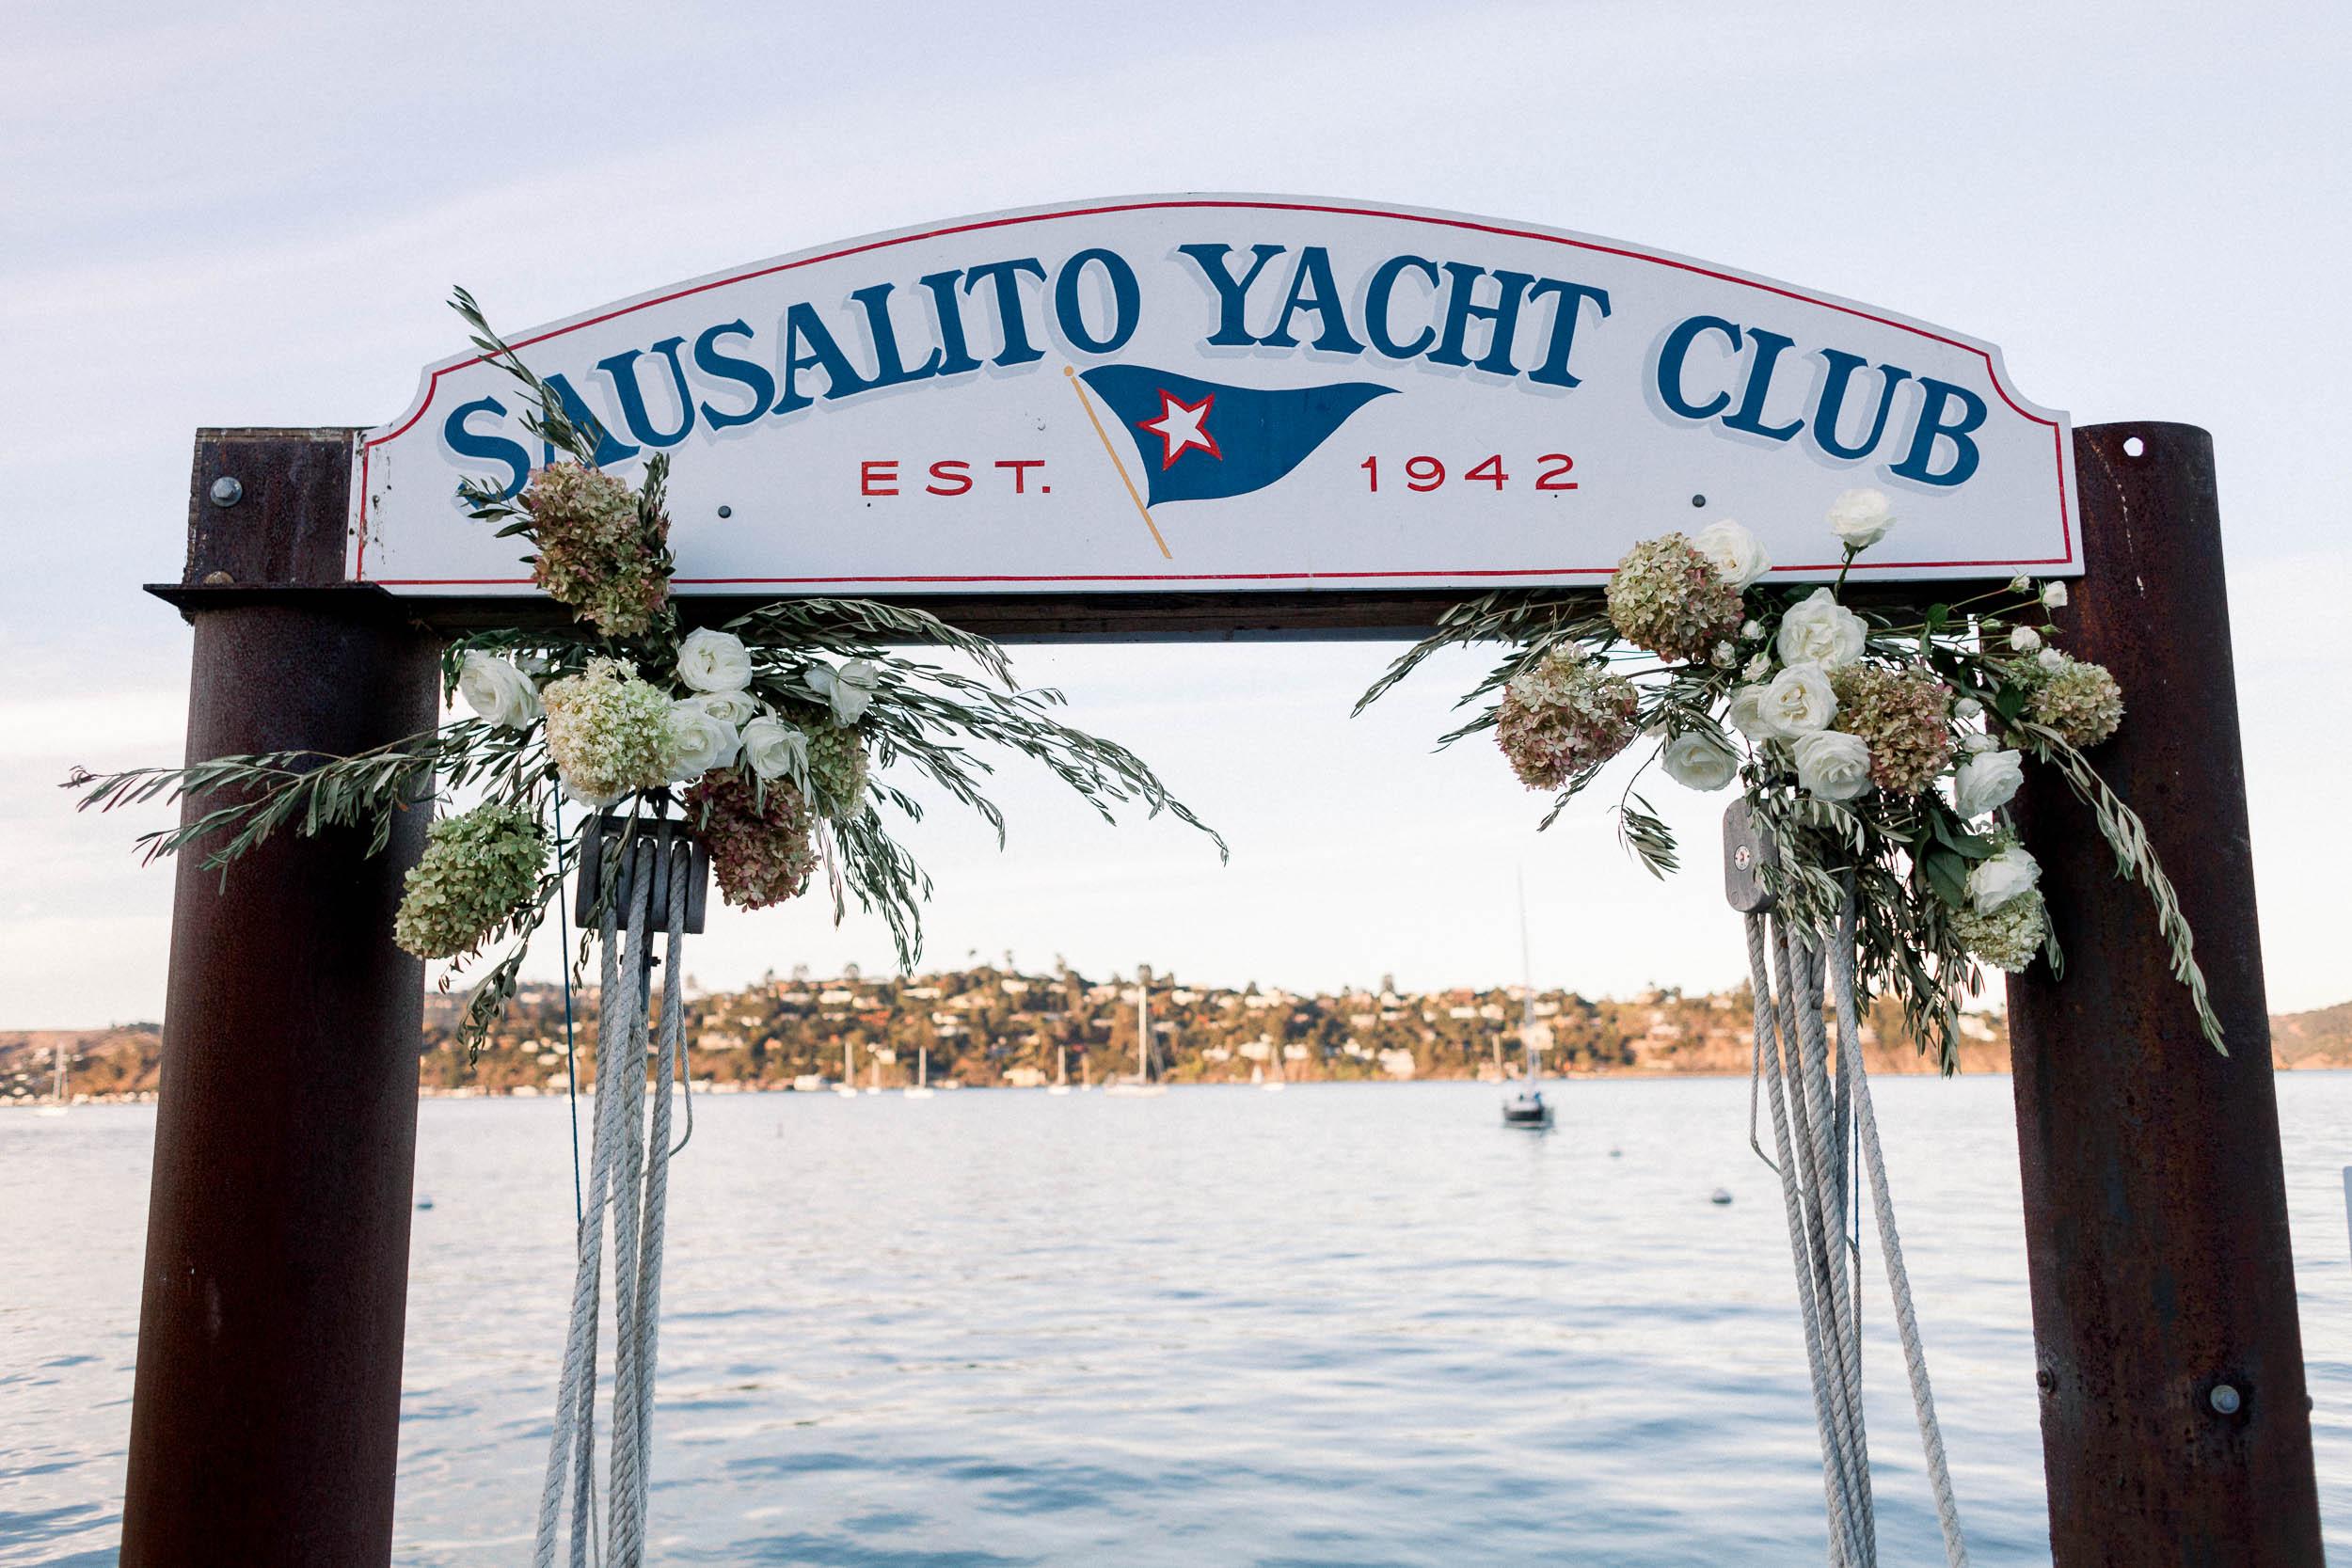 092218ER973_Sausalito Yacht Club Wedding_Buena Lane Photography.jpg